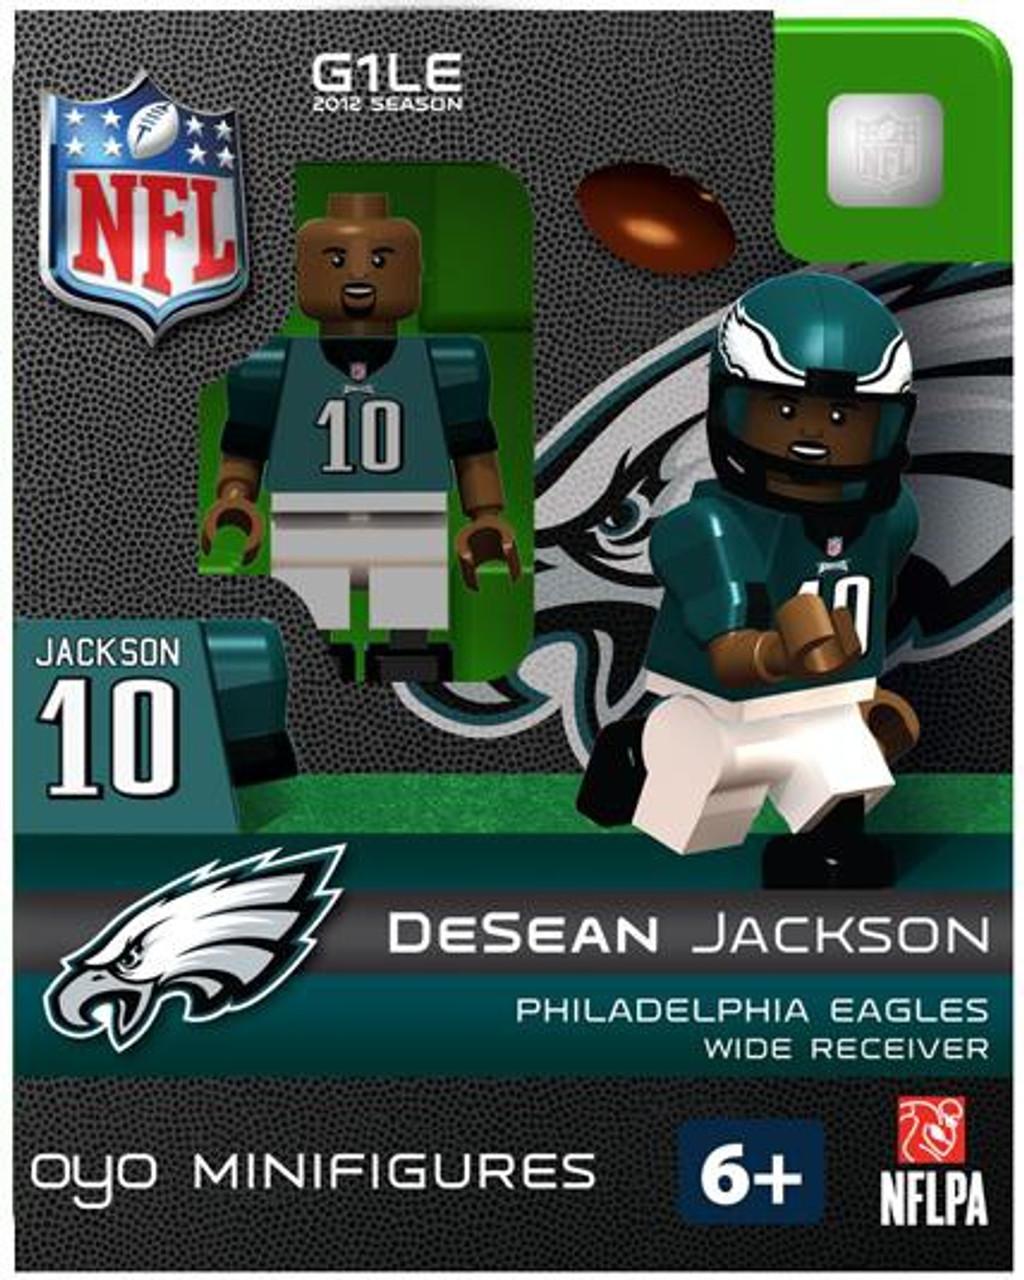 Philadelphia Eagles NFL Generation 1 2012 Season DeSean Jackson Minifigure